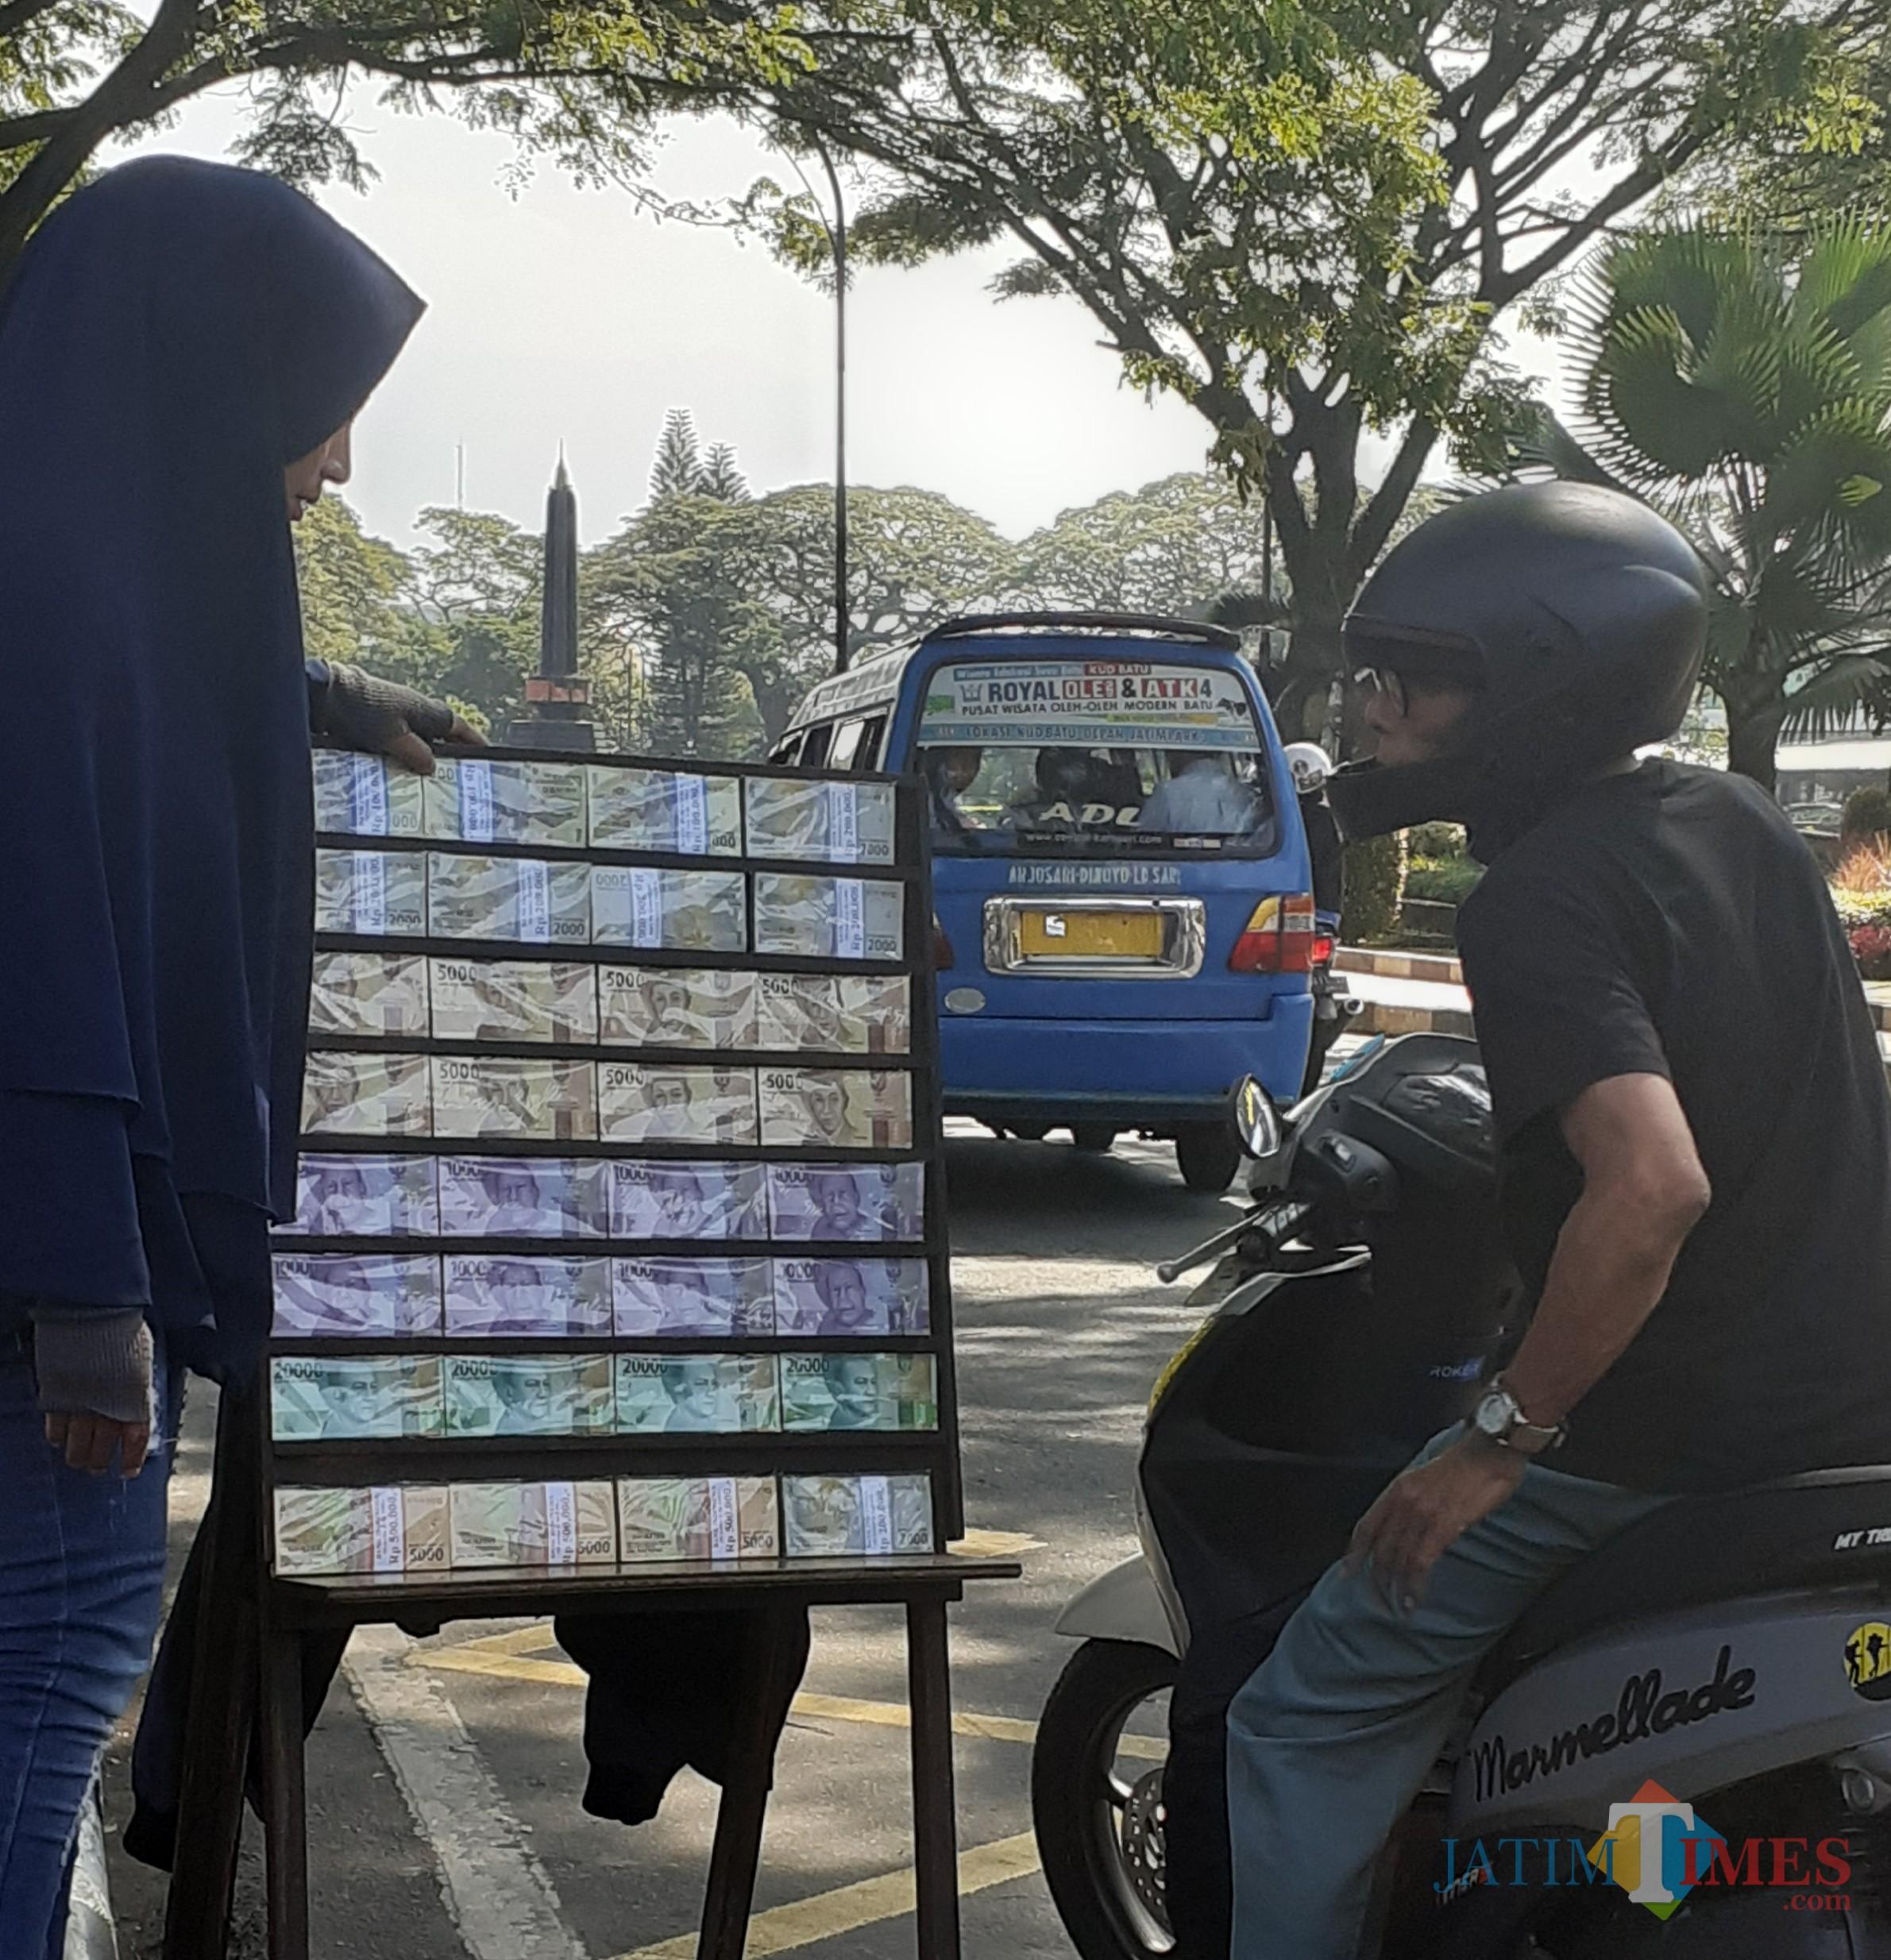 Ilustrasi penyedia jasa tukar uang yang biasa mangkal di pinggir jalan (Arifina Cahyanti Firdausi/MalangTIMES)